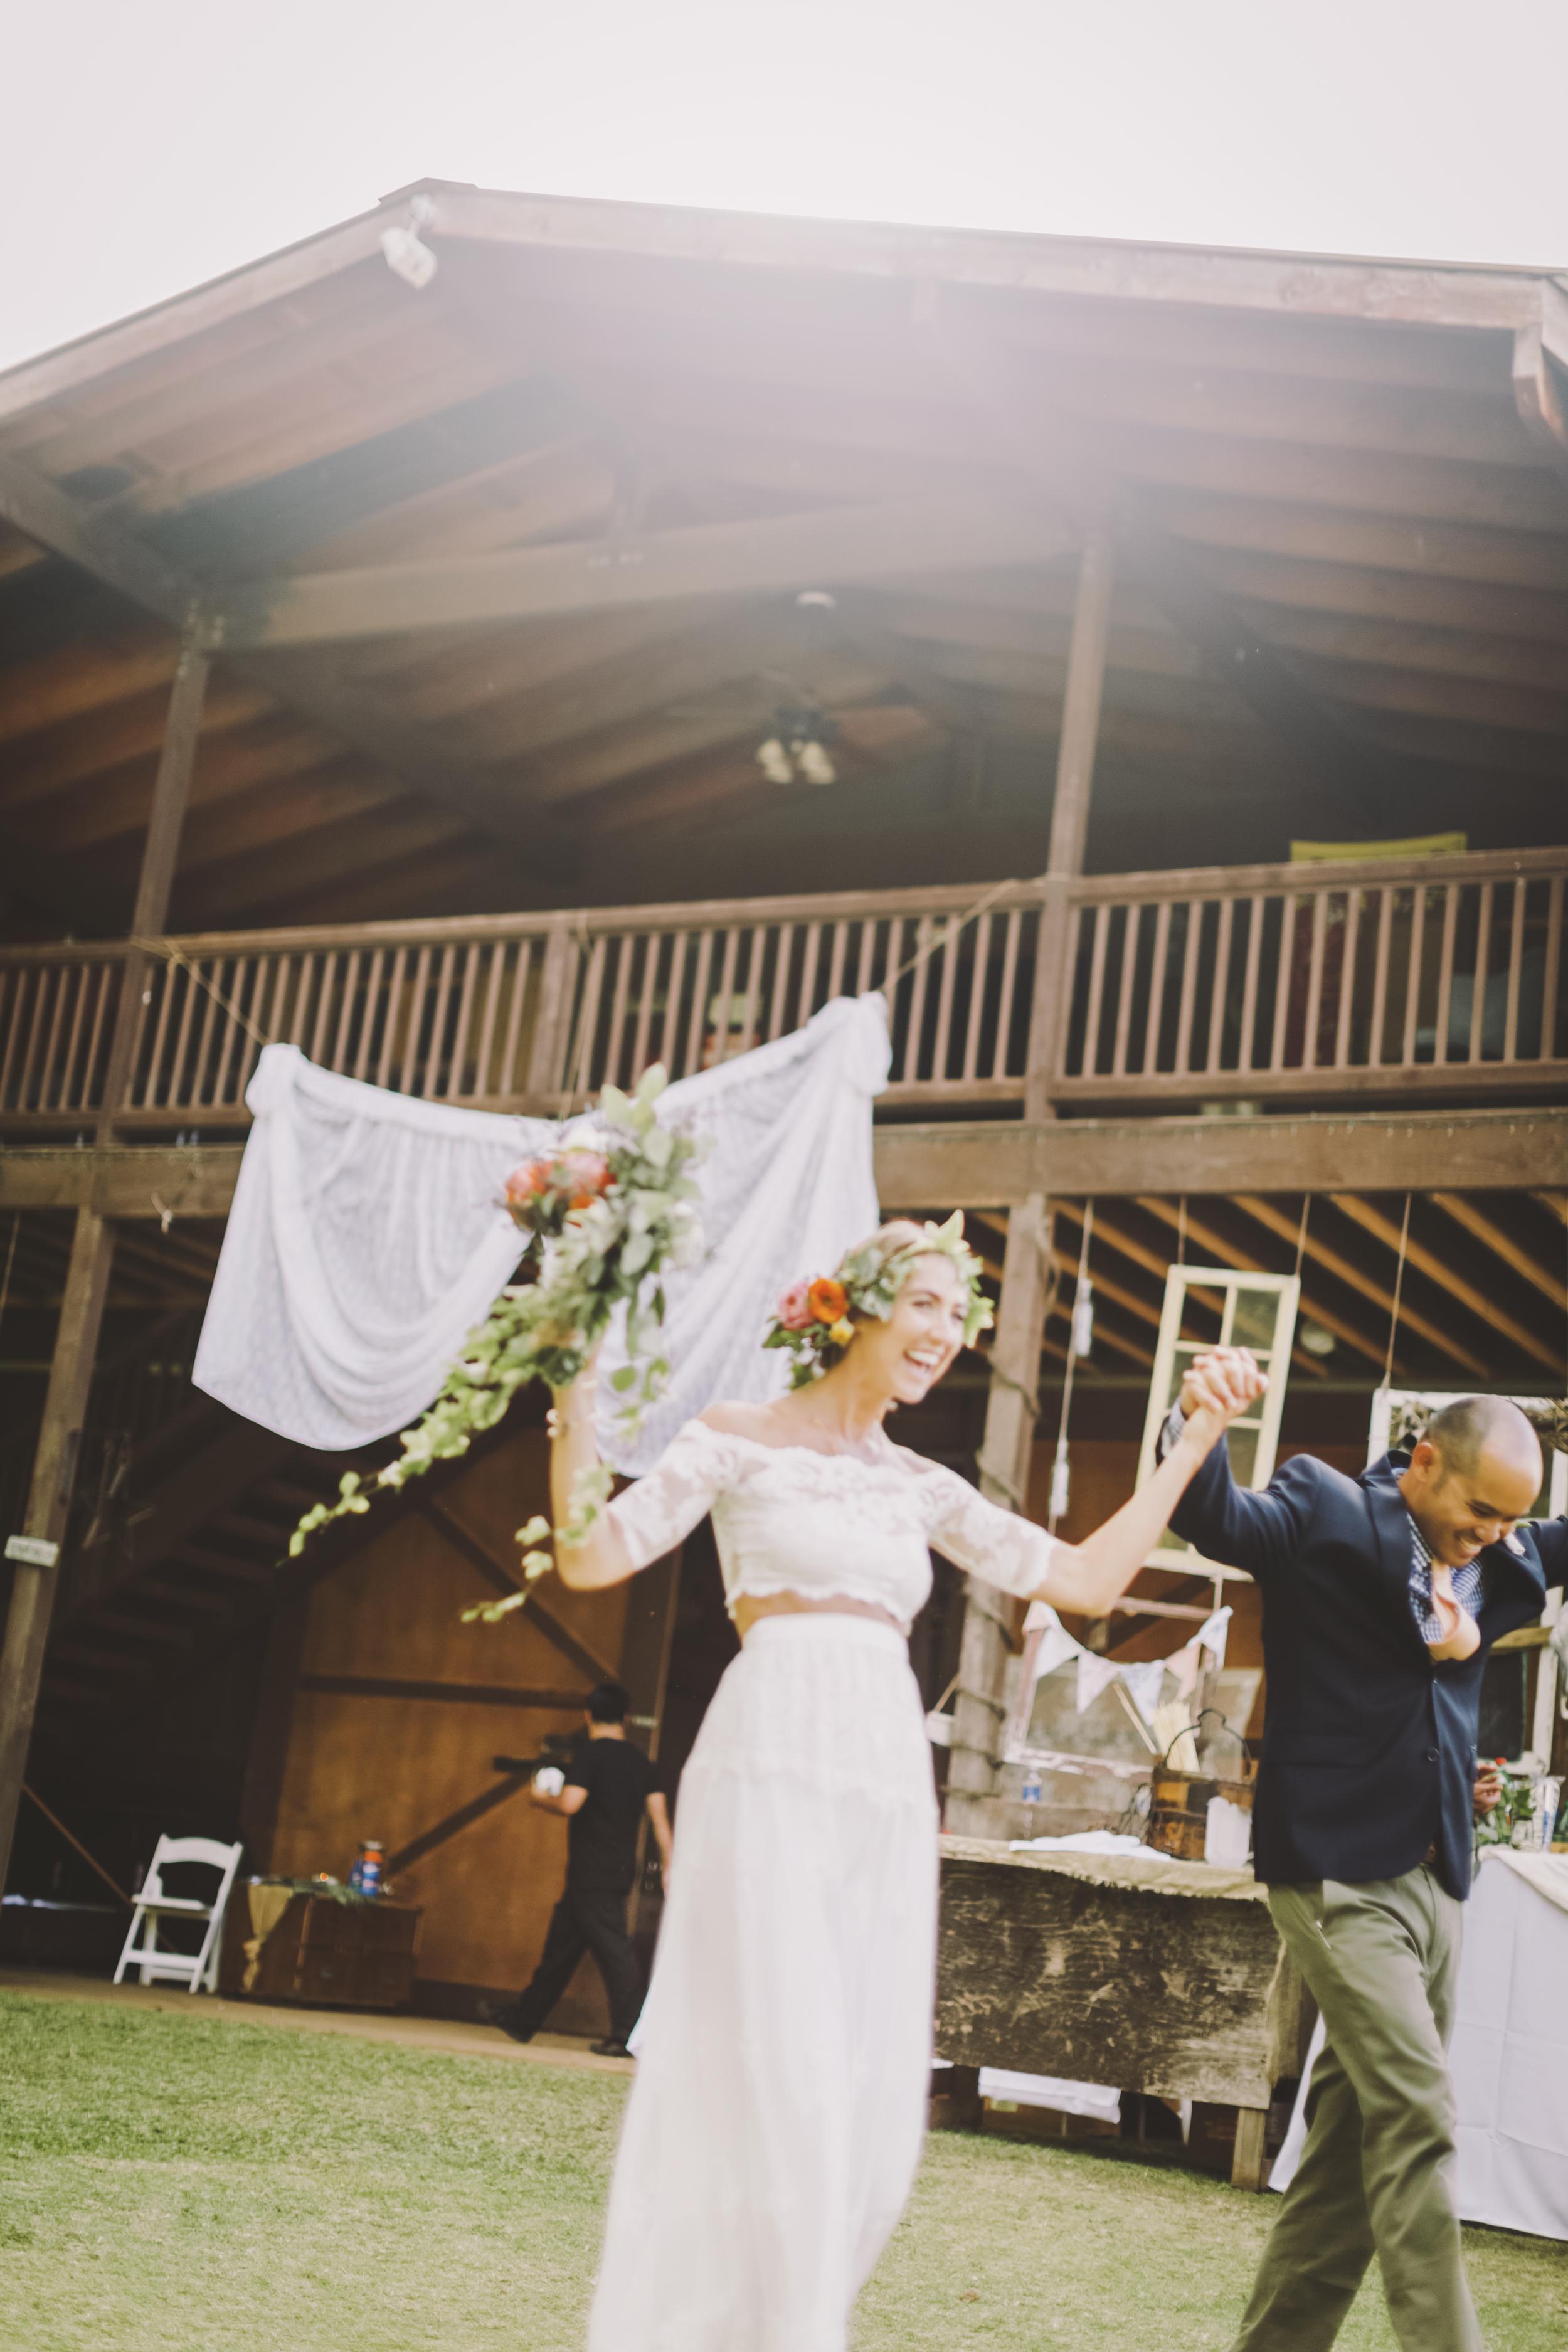 angie-diaz-photography-oahu-hawaii-wedding-tradewinds-ranch-100.jpg